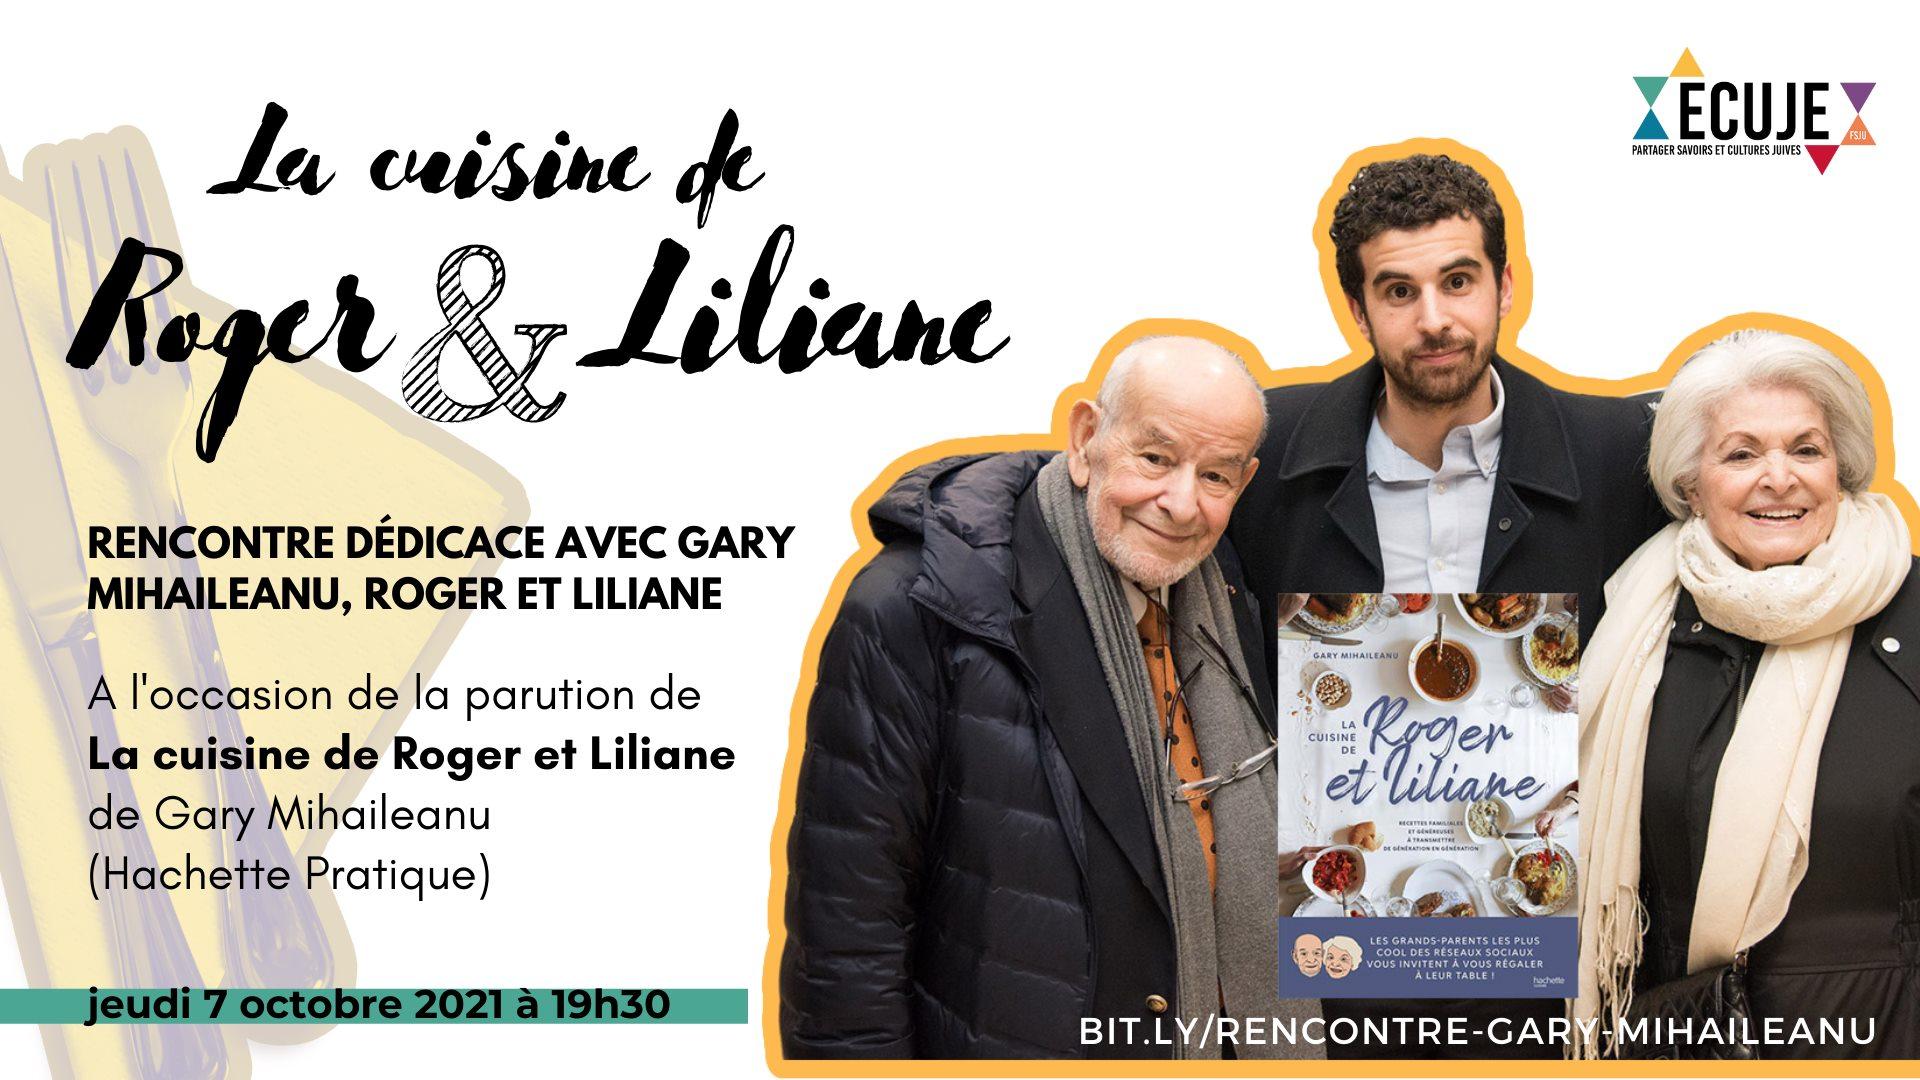 La cuisine de Roger et Liliane, avec Gary Mihaileanu